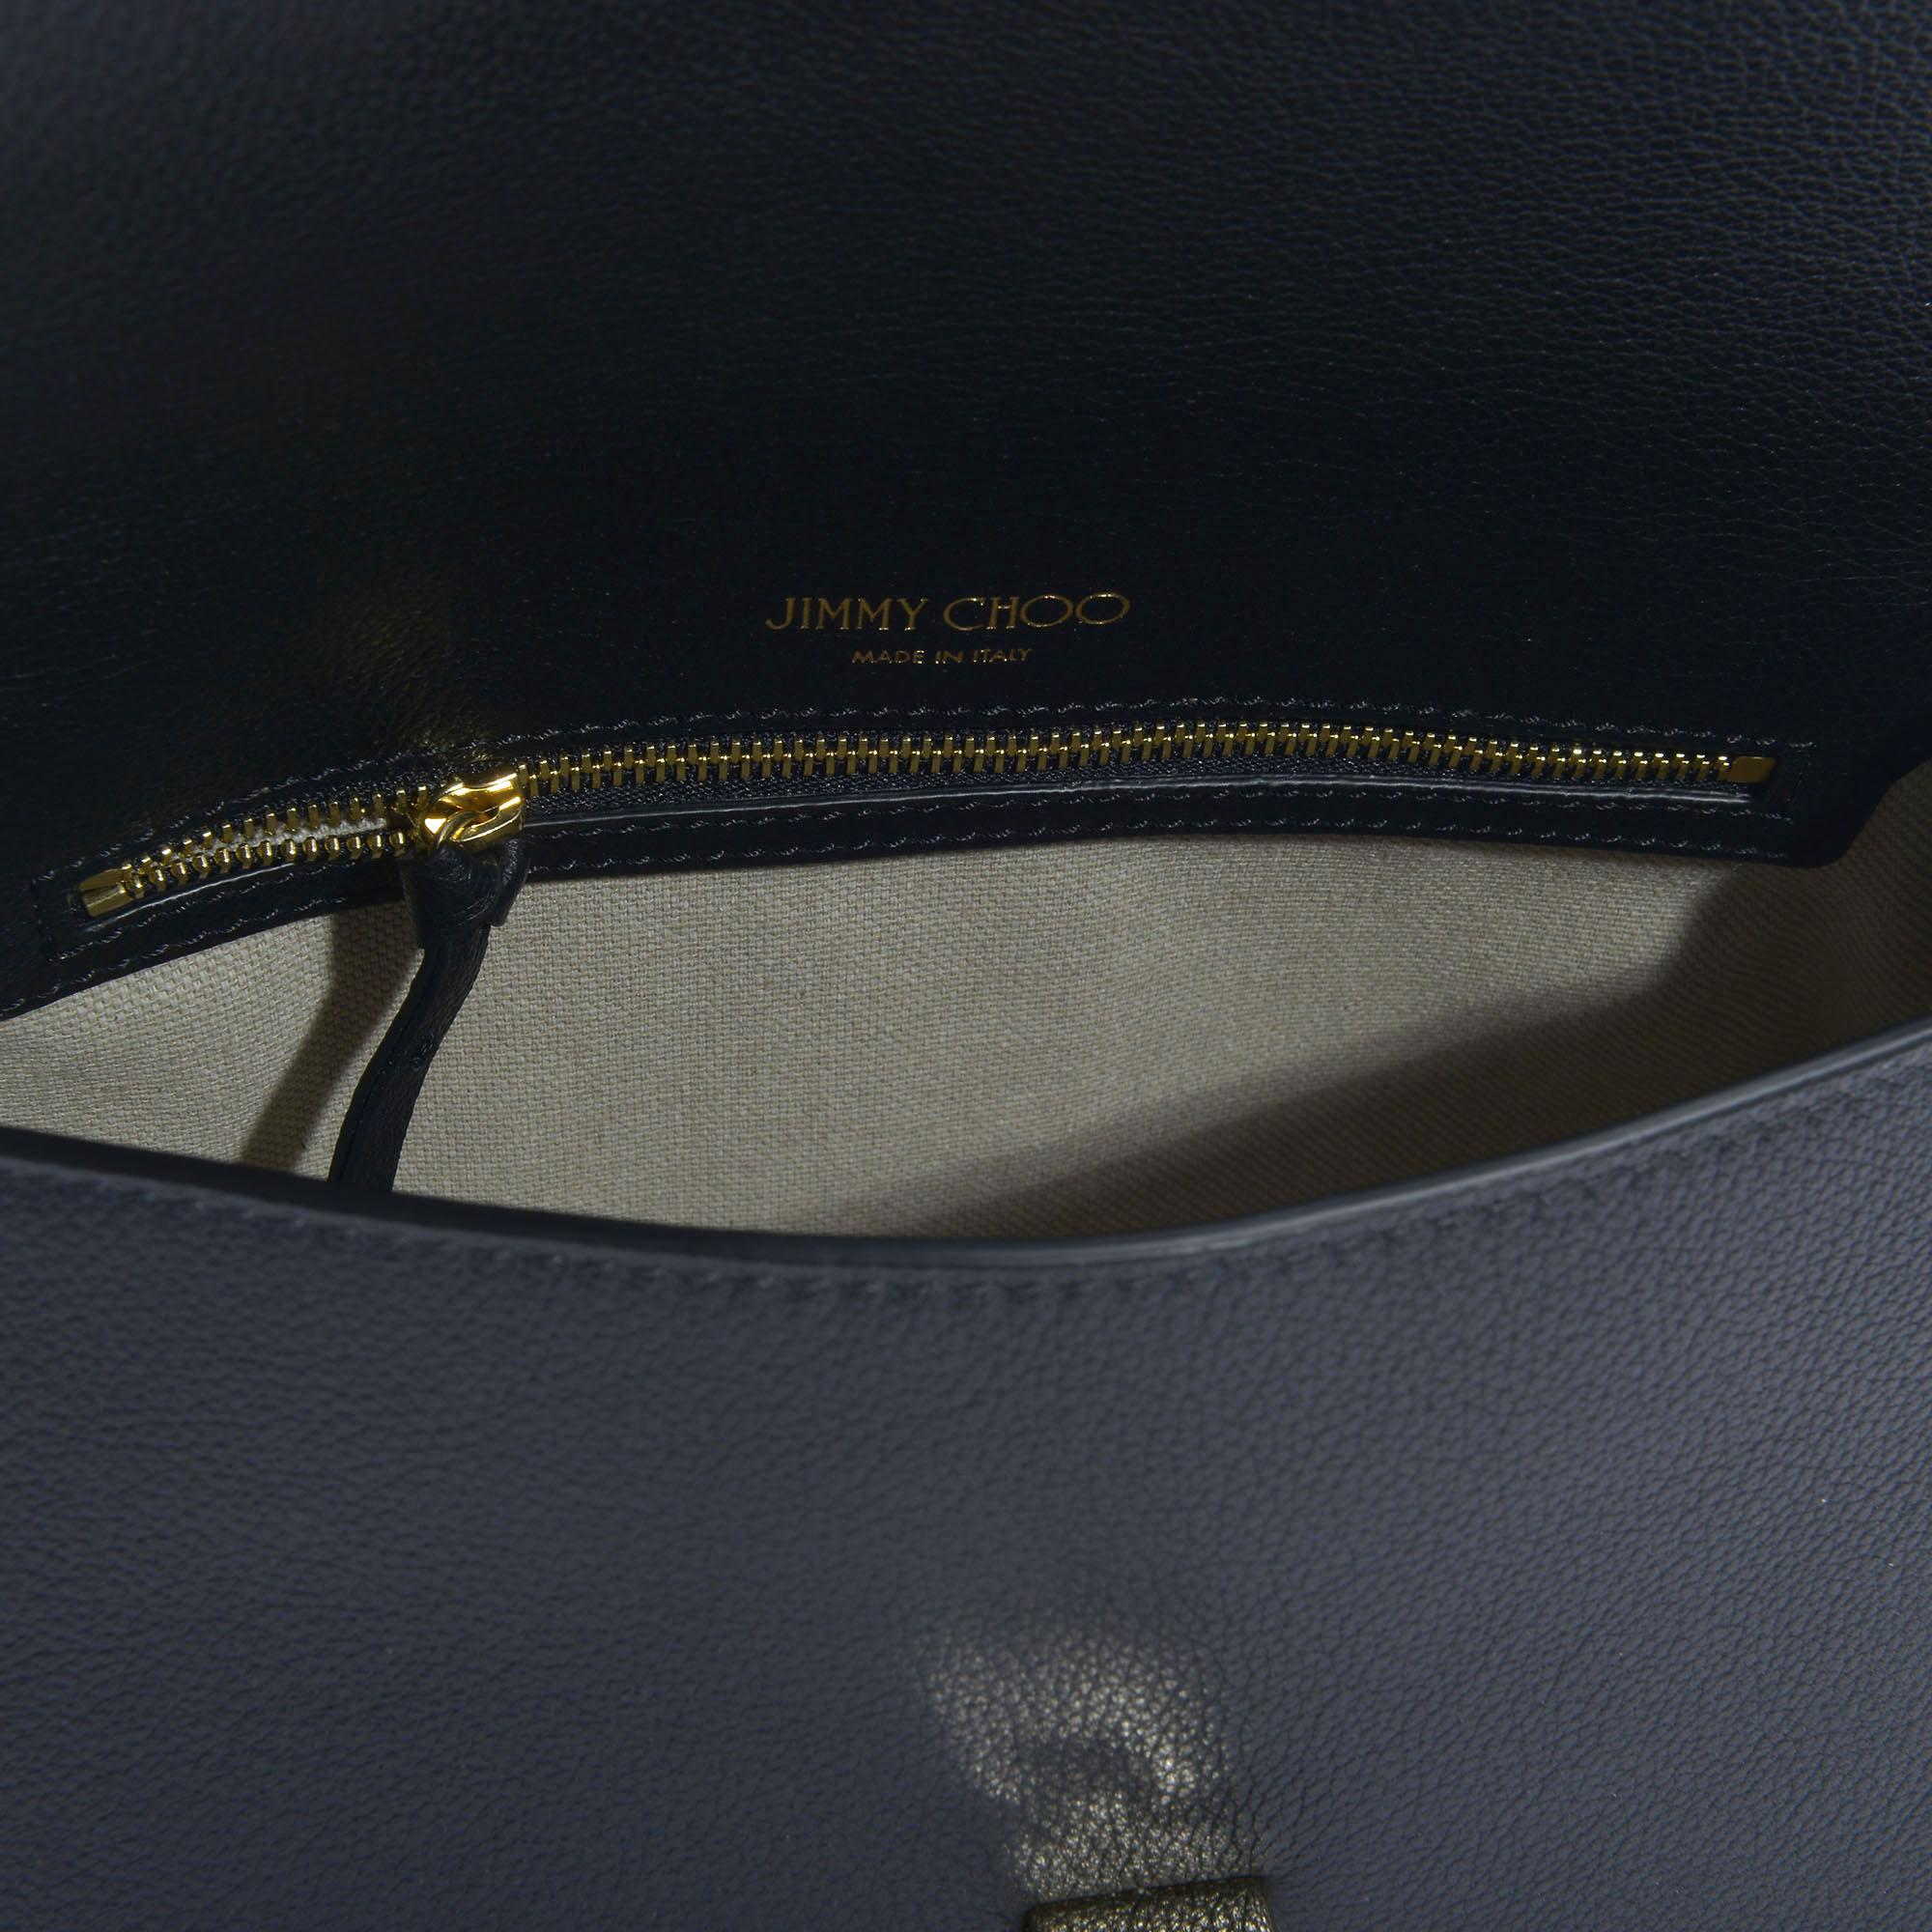 c7e143e0e9d jimmy-choo-Black-Marianne-Shoulder-Bag-In-Black-Grainy-Calf-Leather.jpeg